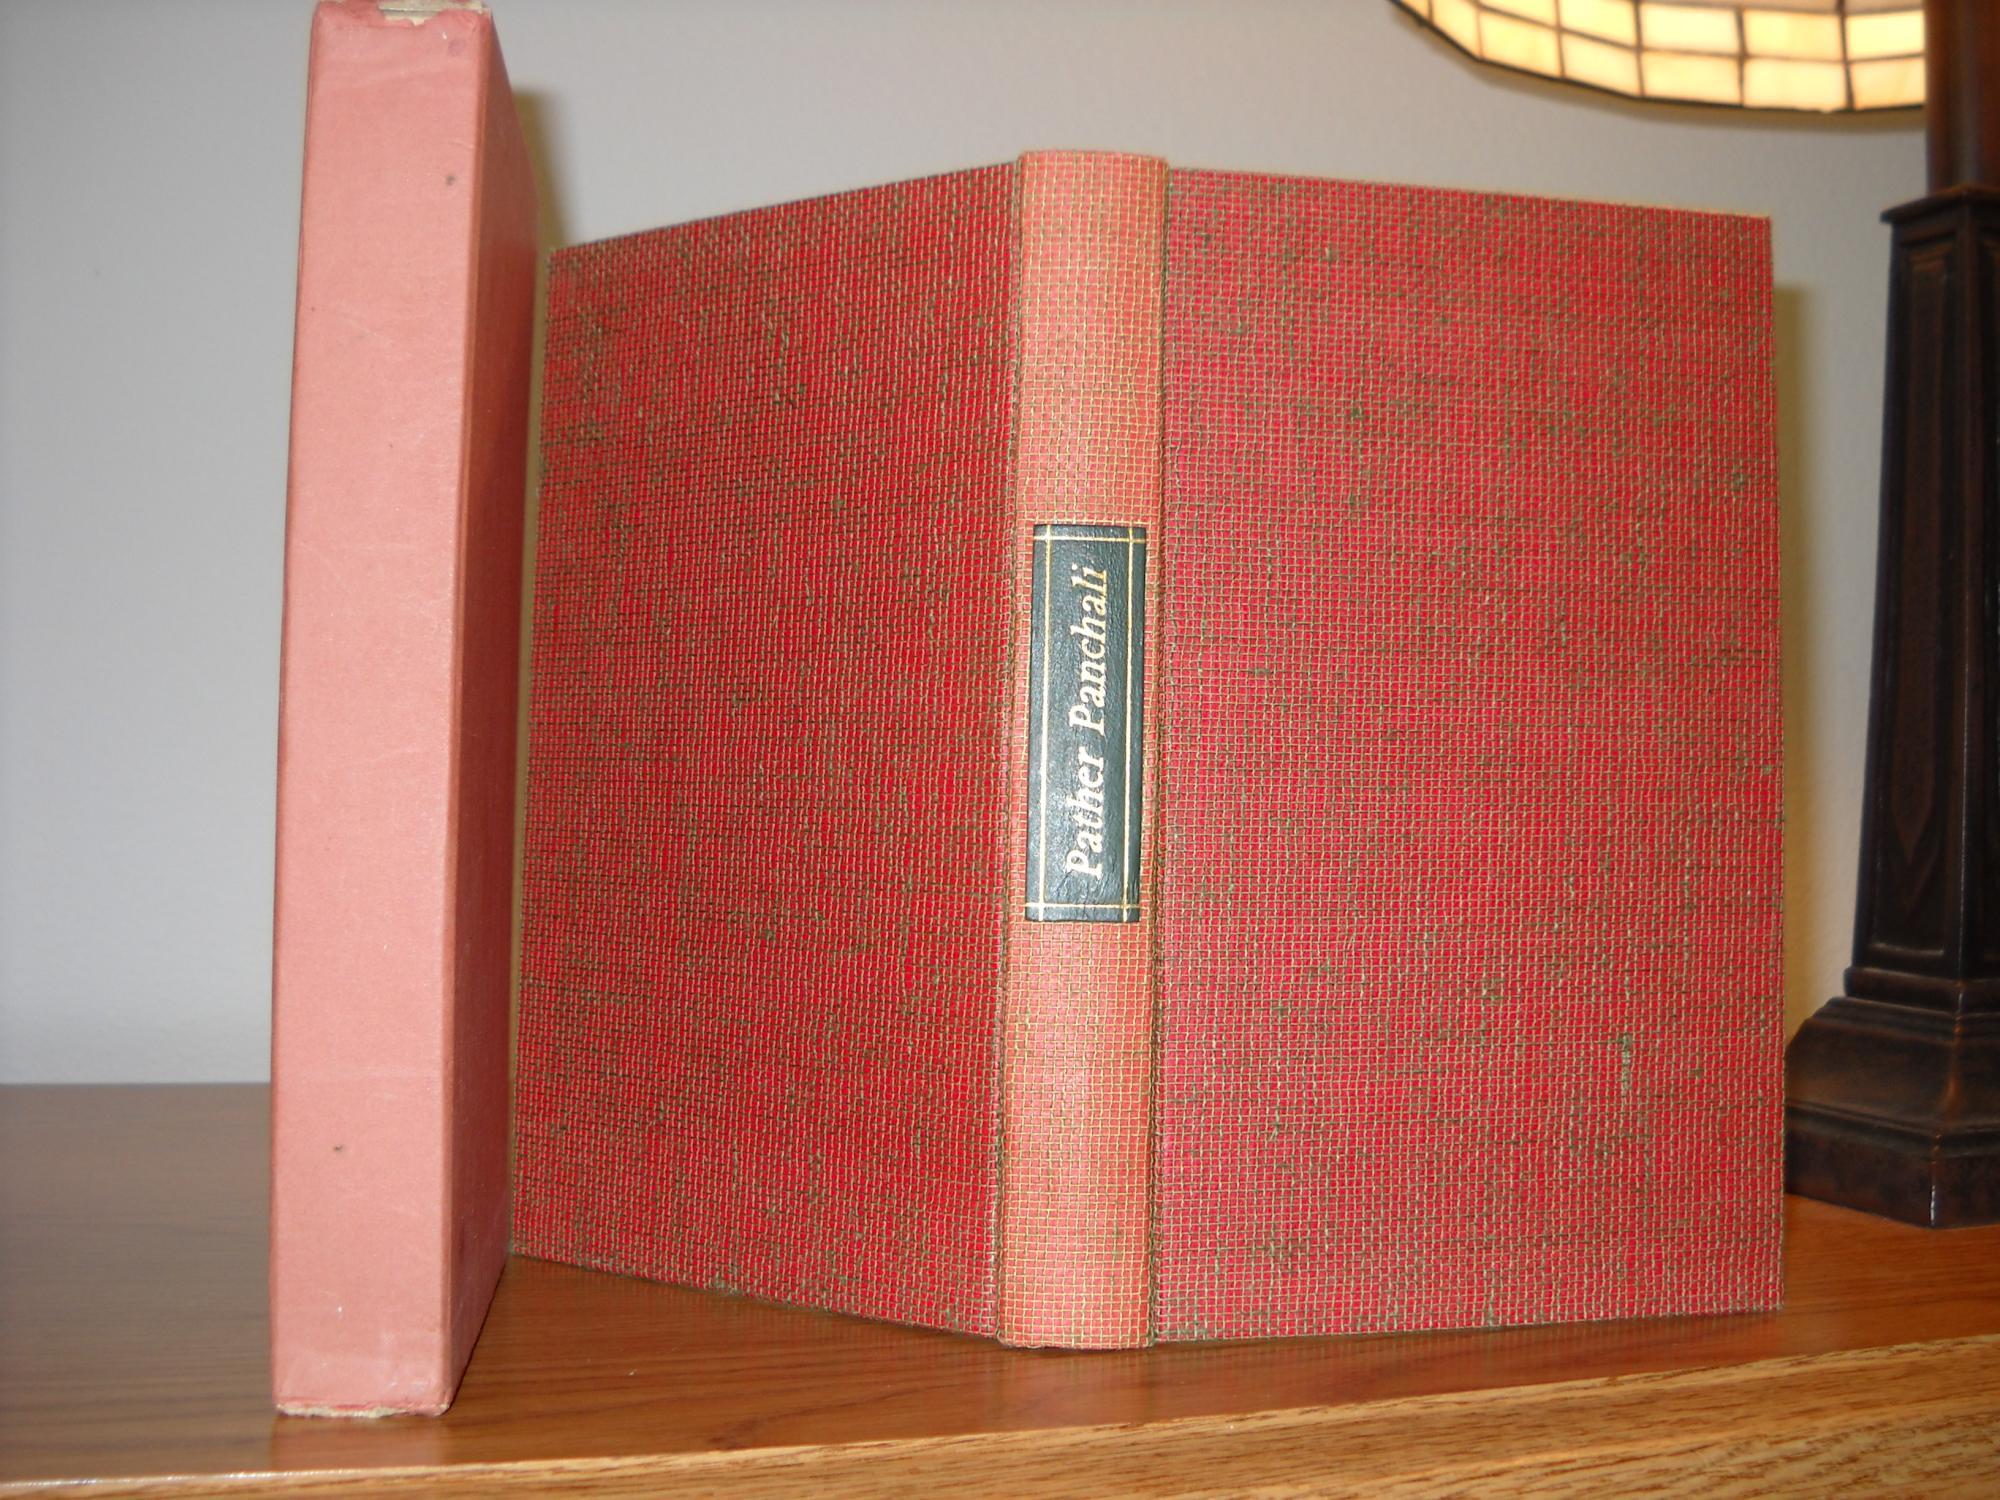 Pather Panchali, Song Of The Road: Banerji, Bibhutibhushan, Translated by T. W. Clark and Tarapada ...